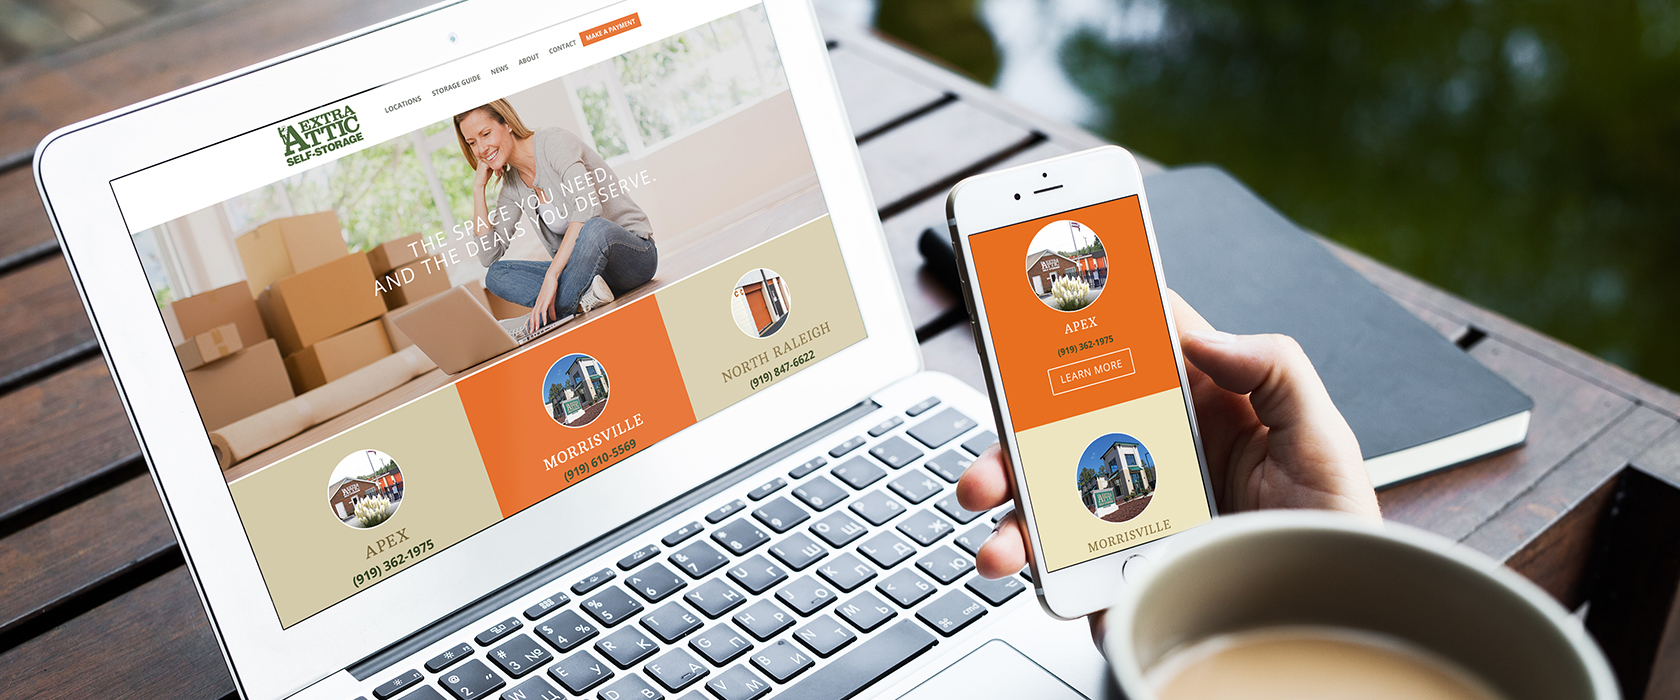 extra-attic-self-storage-responsive-web-design